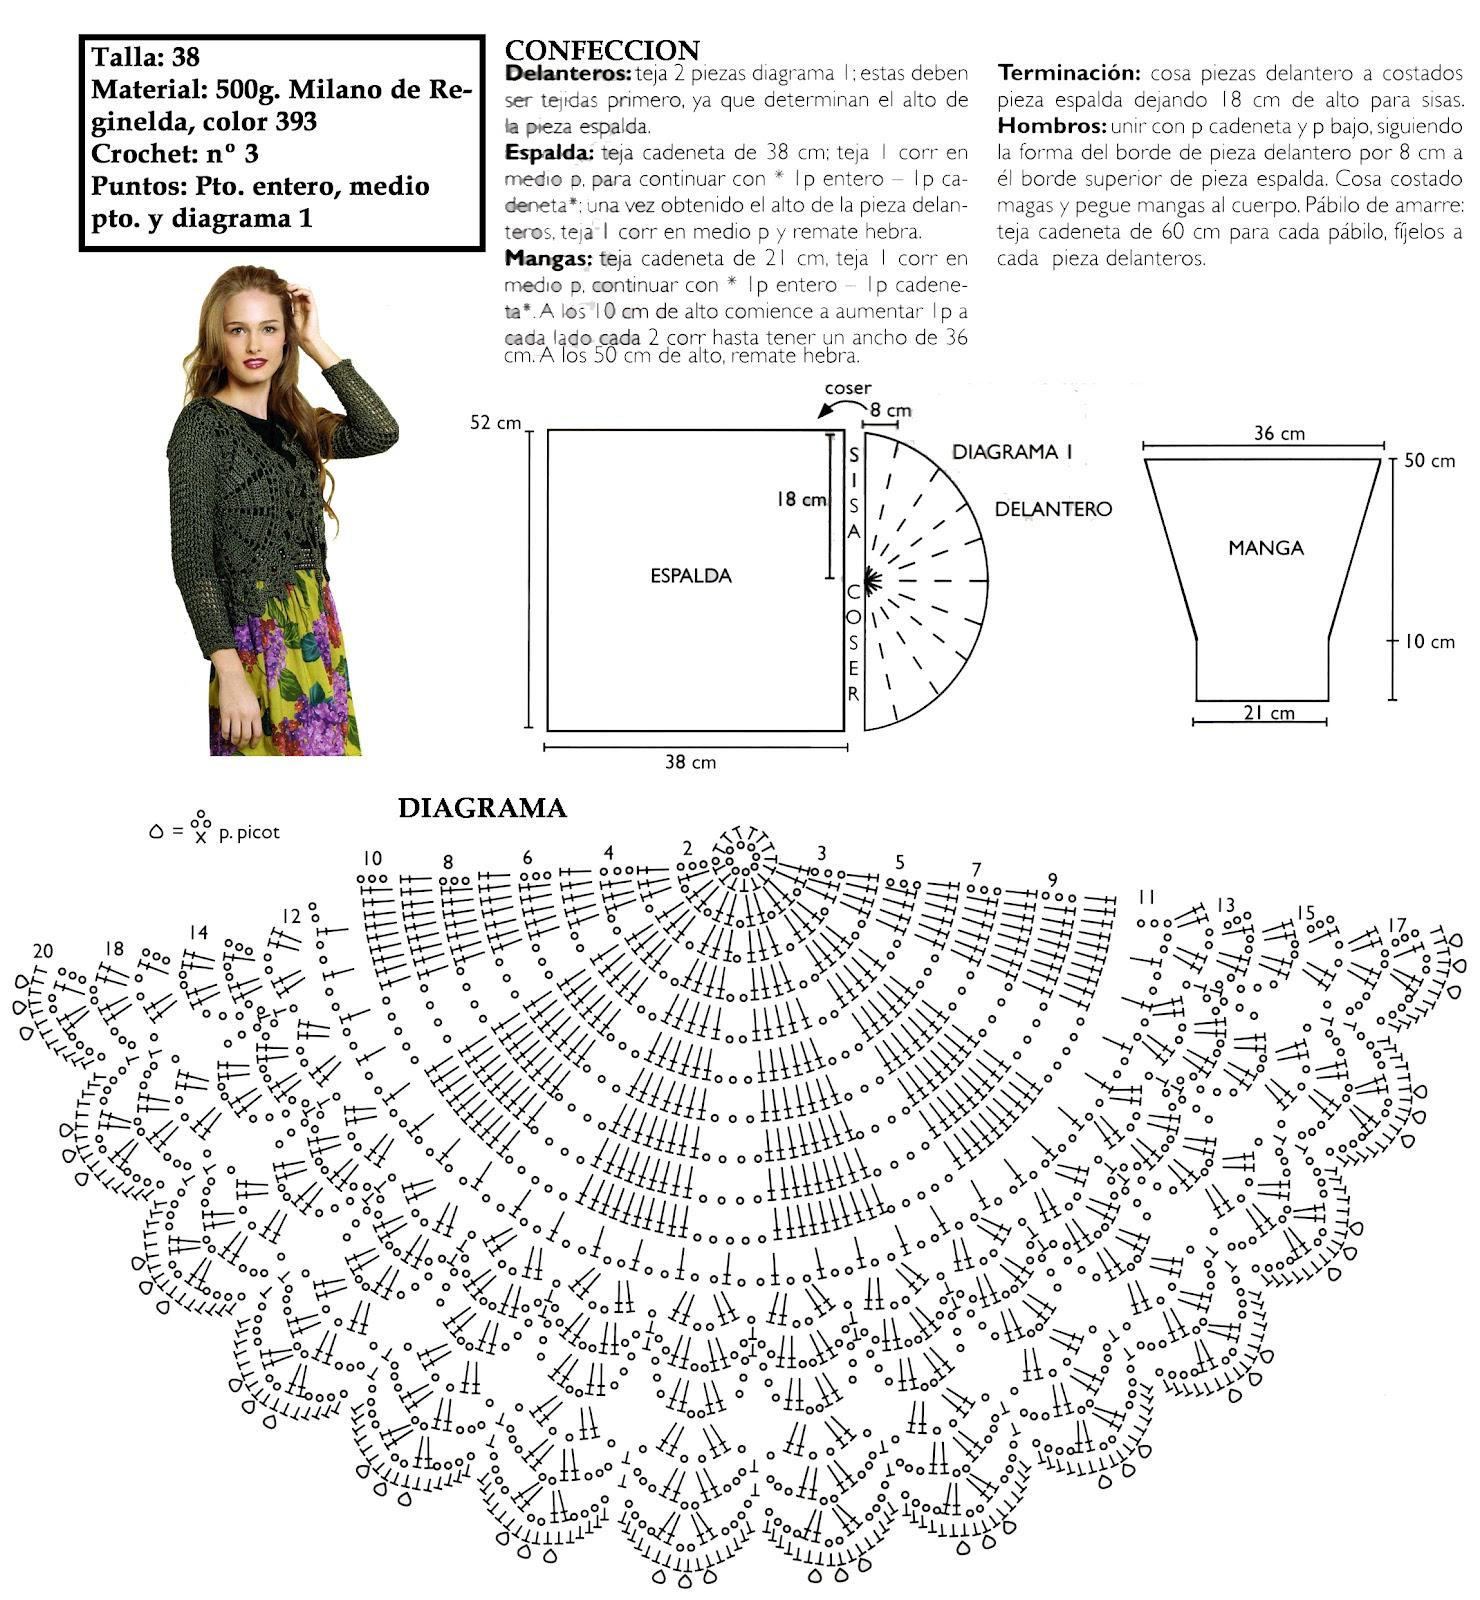 Chaqueta semi circular con mangas patron - Patrones Crochet ...